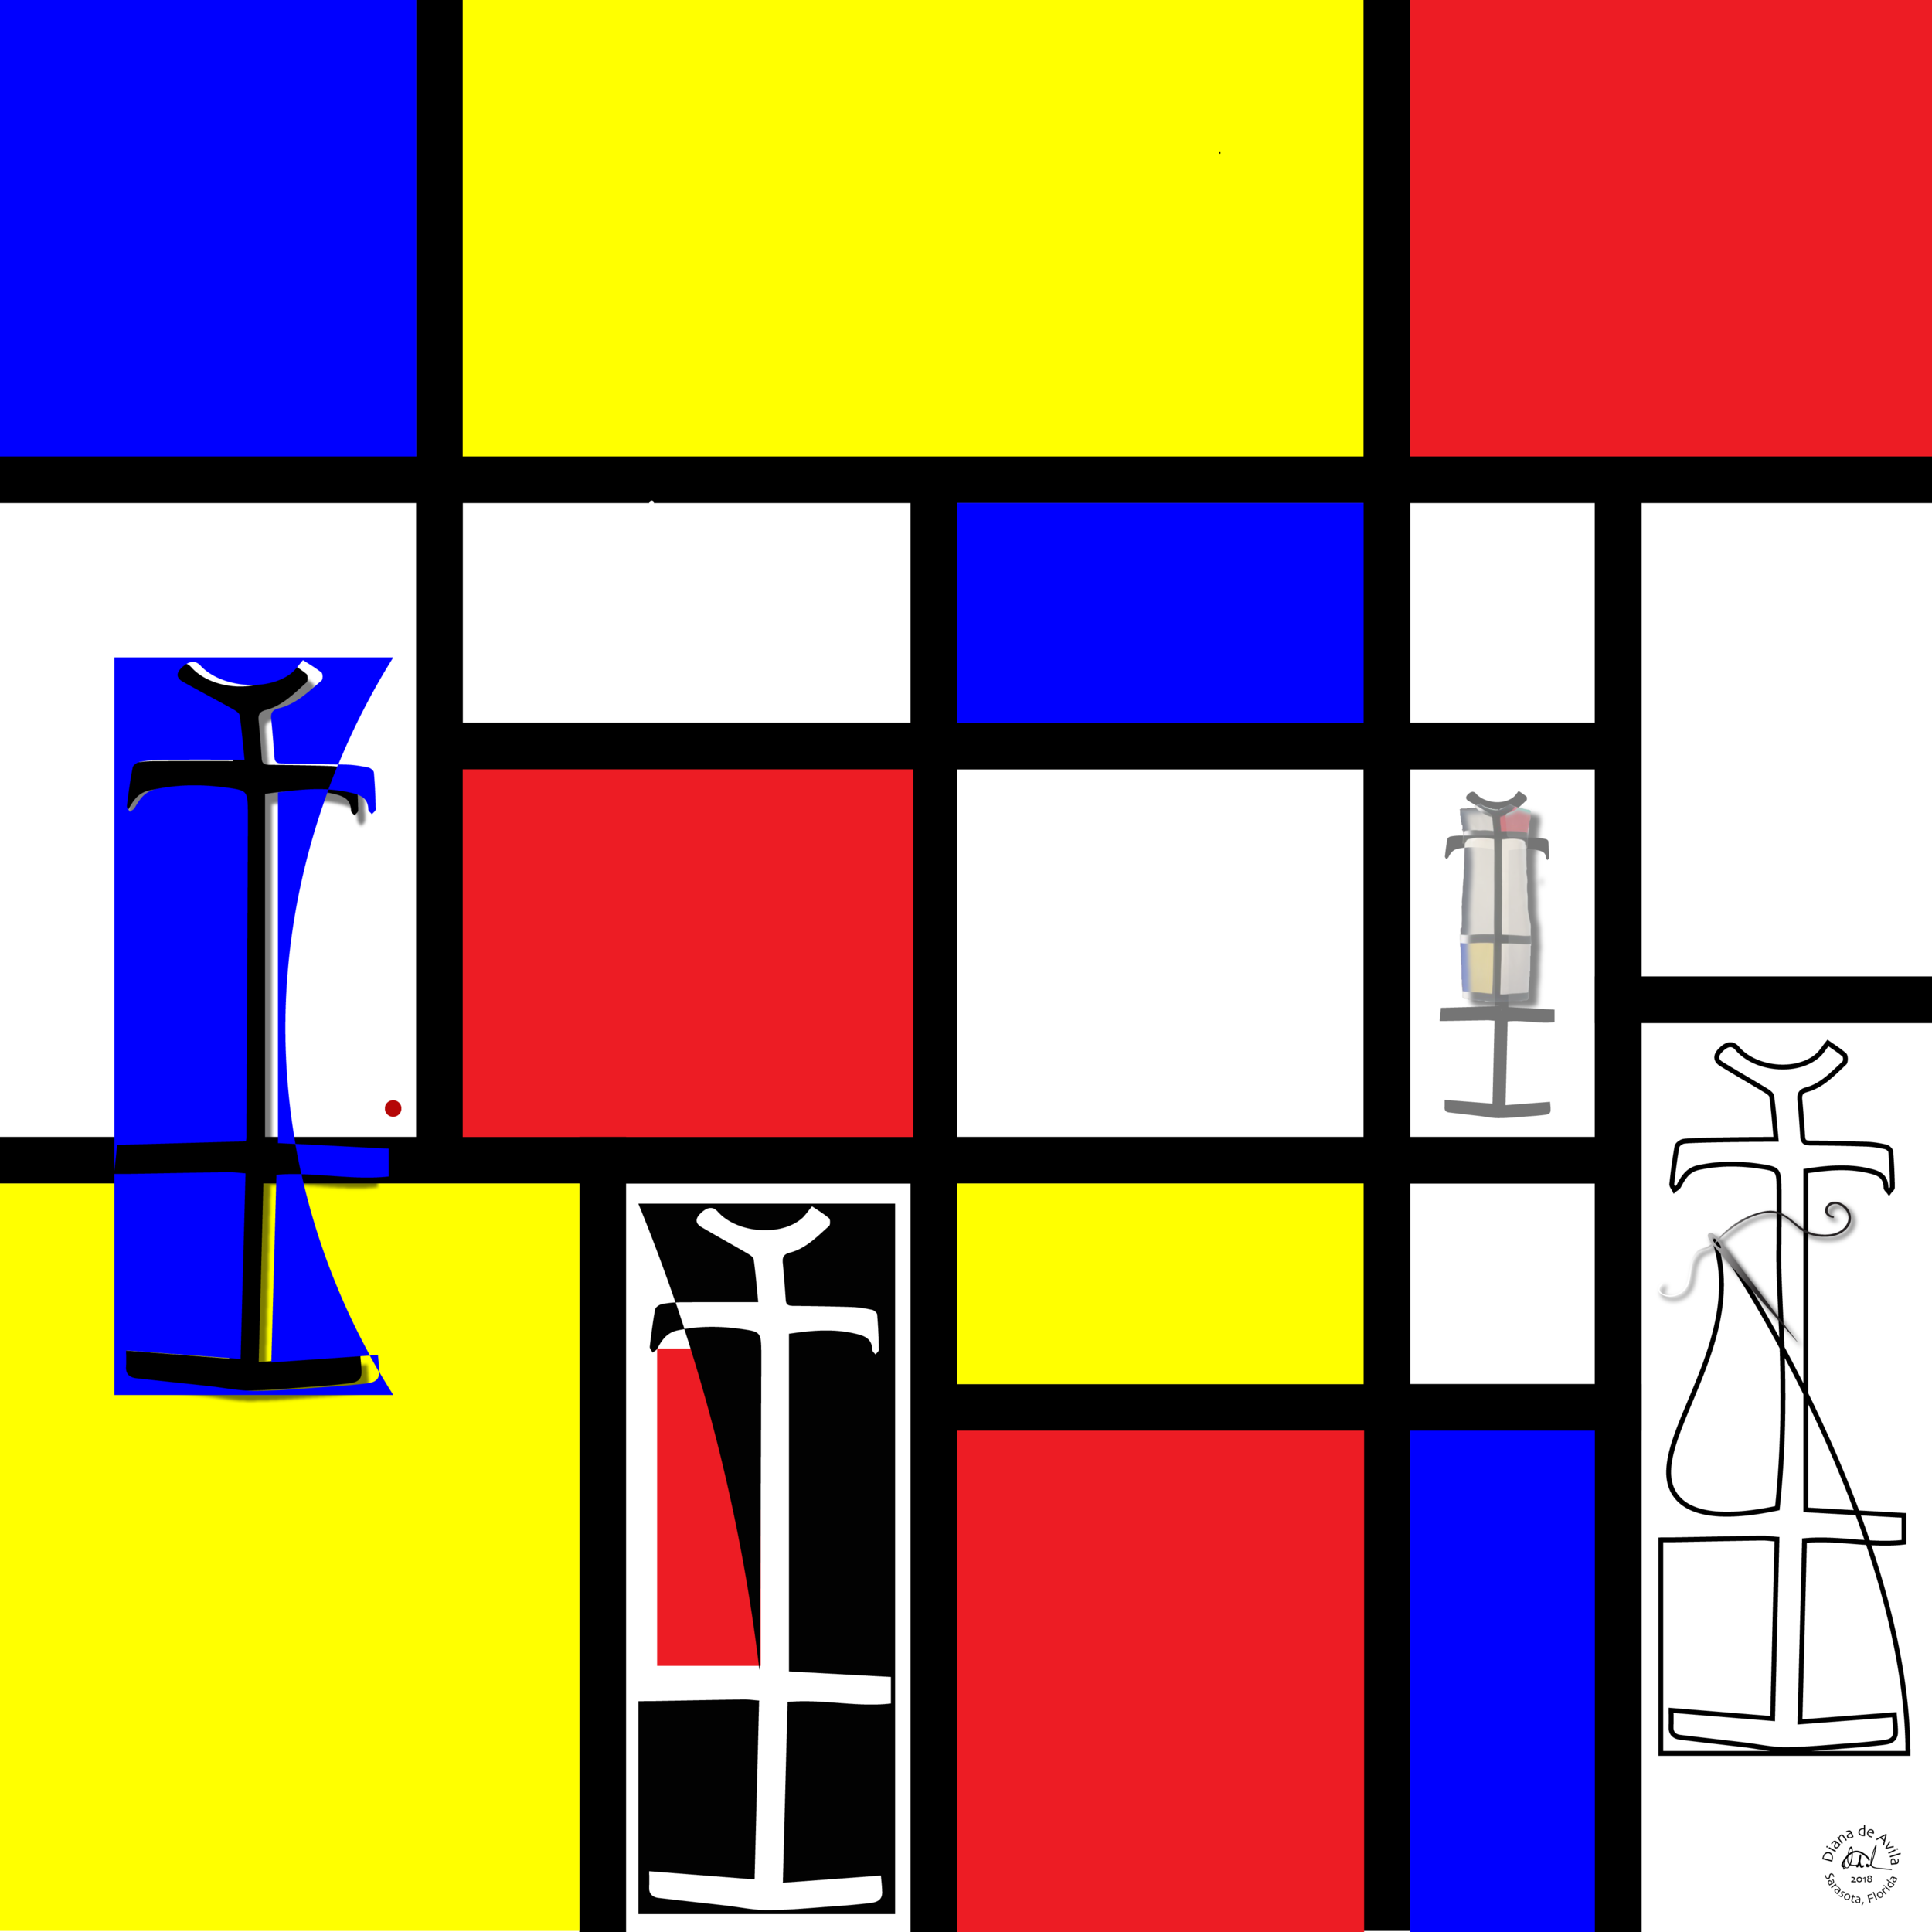 """Dressing Mondrian"" featuring the YSL classic Mondrian Dress."